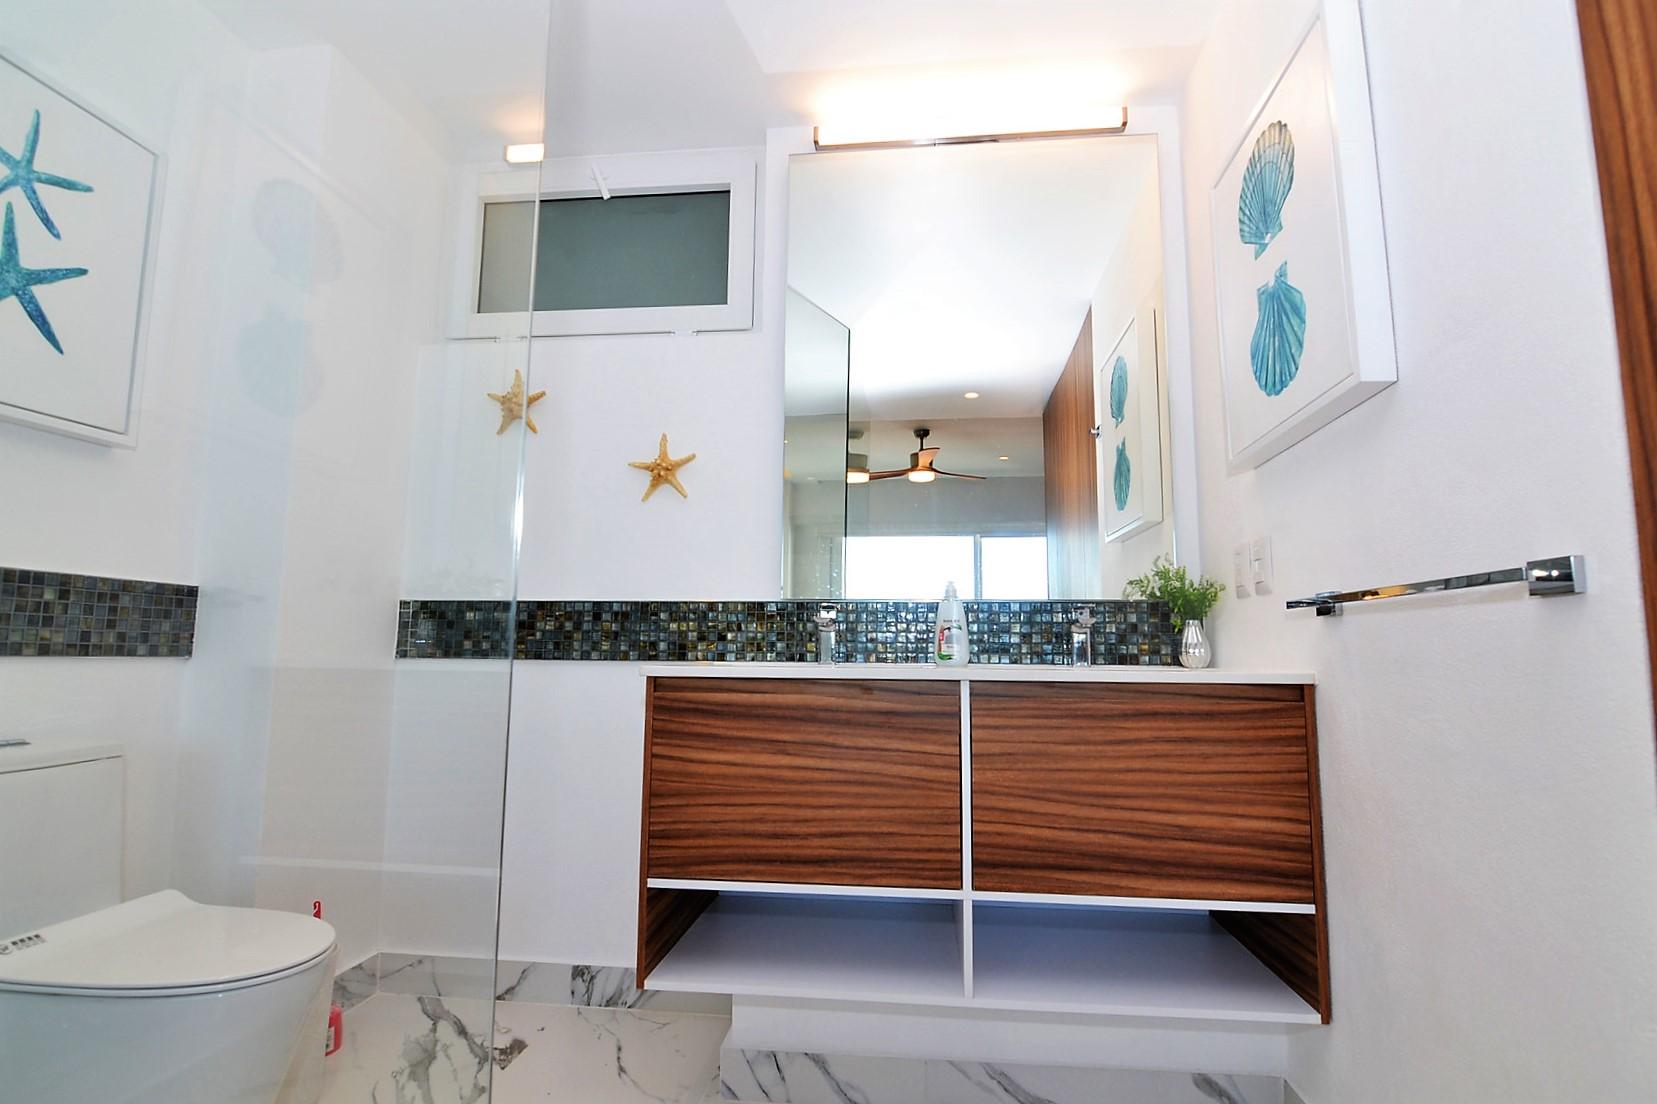 Condo Avida Super Studio 4 - Puerto Vallarta Furnished Condo Romantic Zone (38)